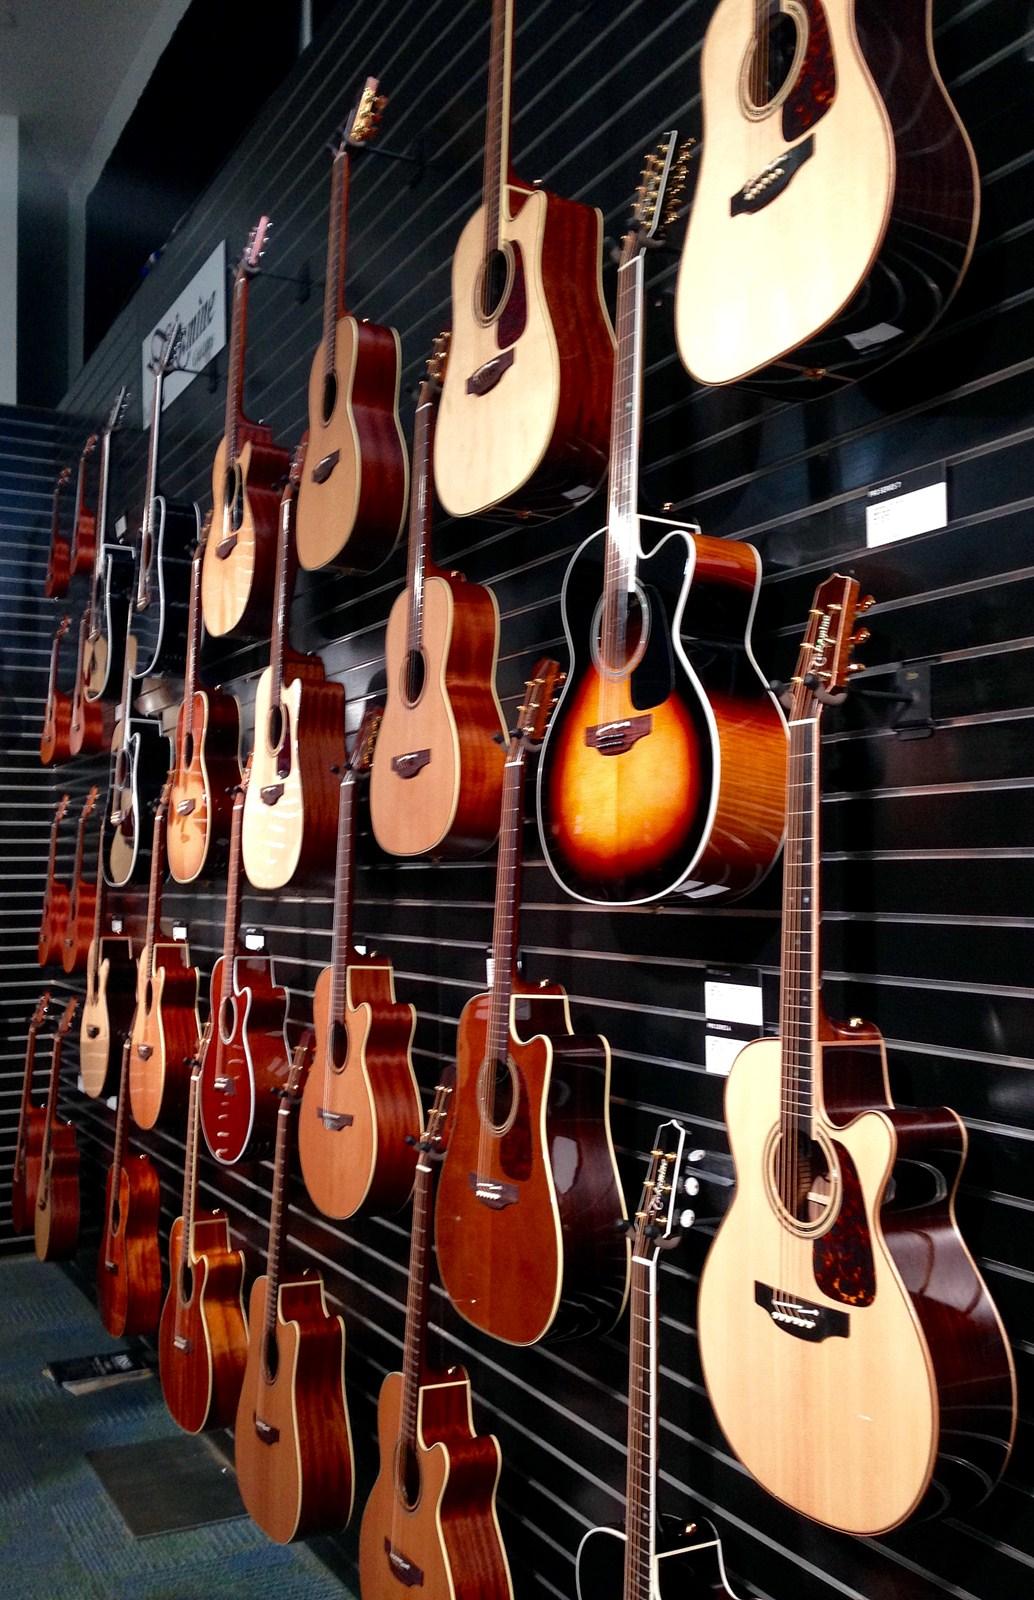 Guitarras acústicas en el NAMM Show